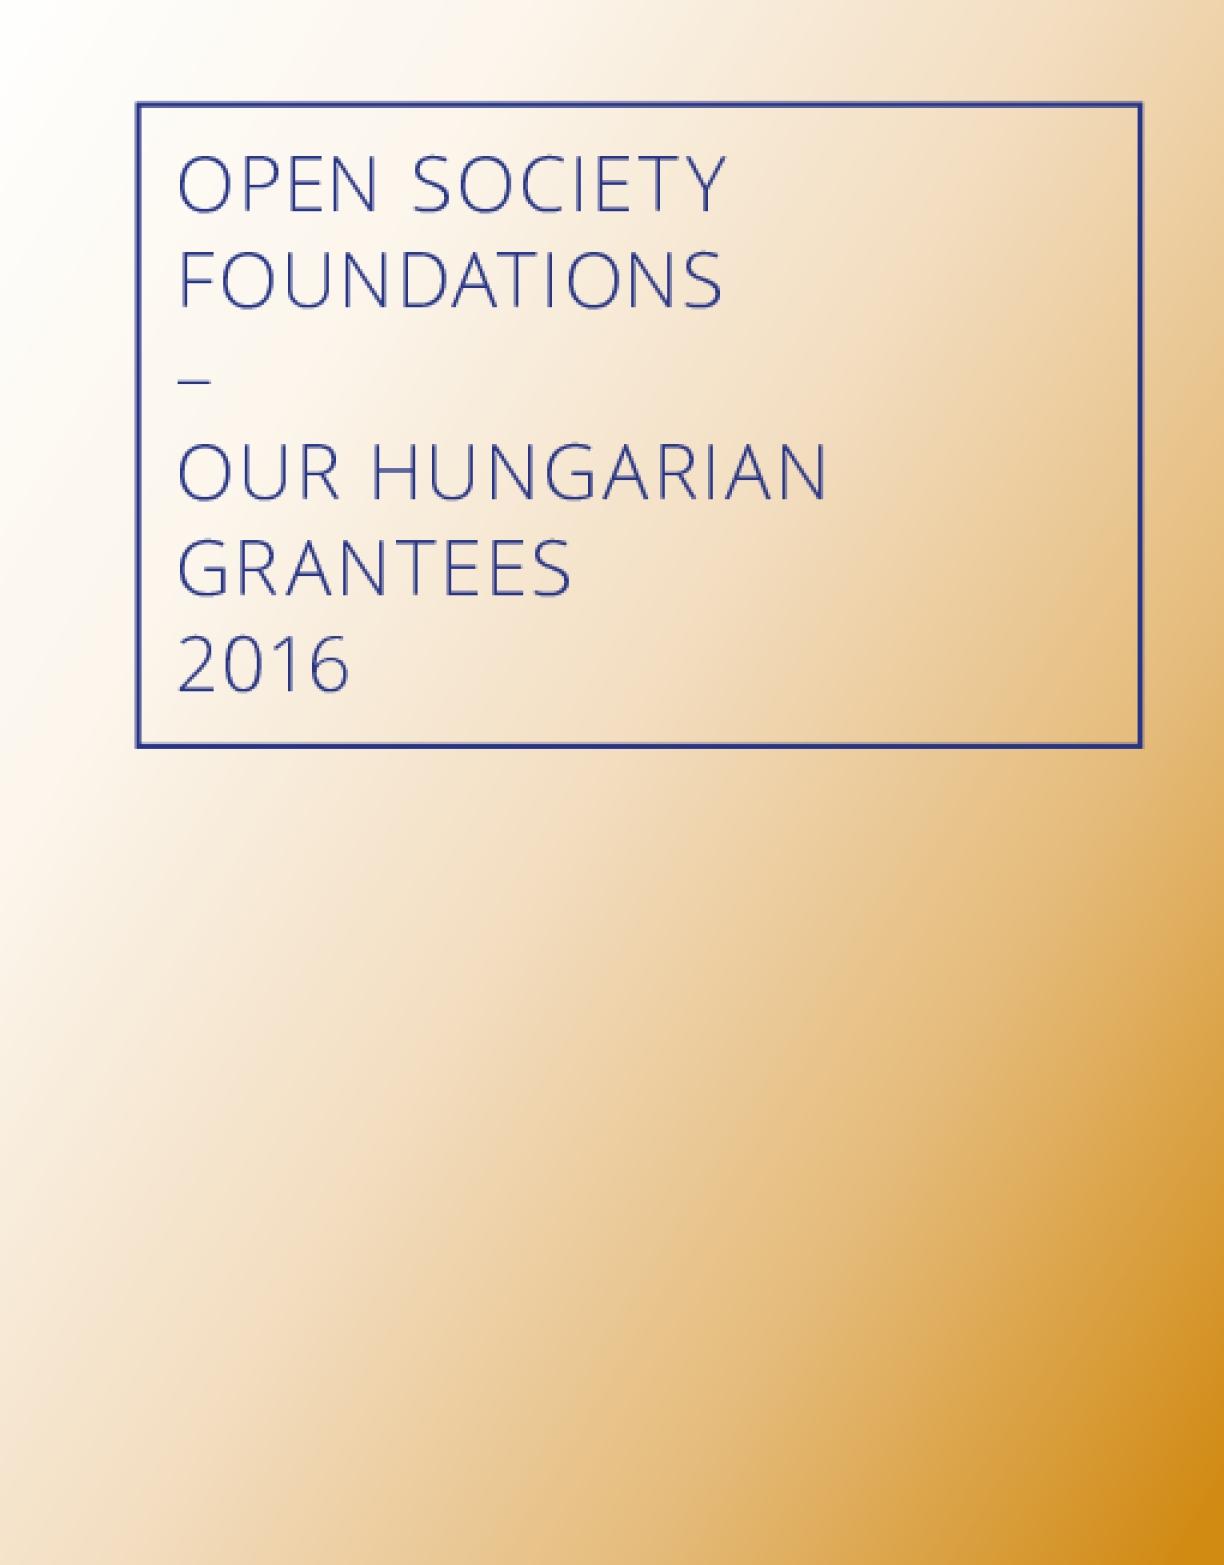 Open Society Hungarian Grantees 2016